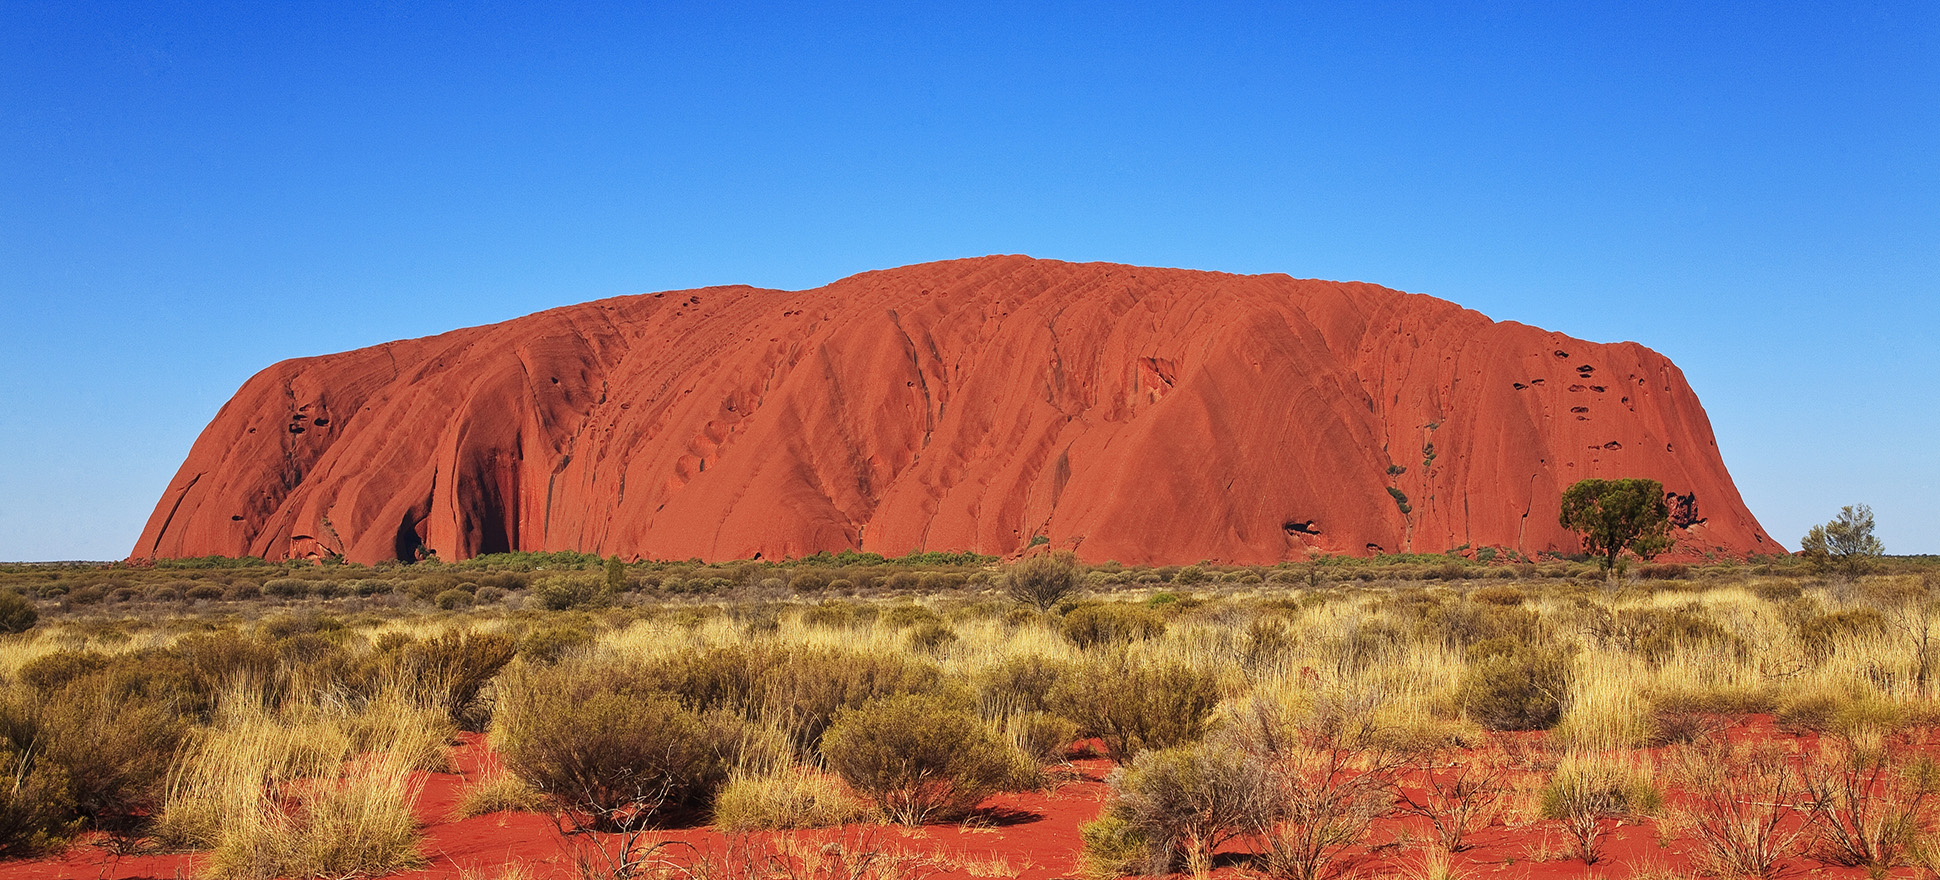 uluru   red rock   australia   Tours to Australia – the Land of Wonders